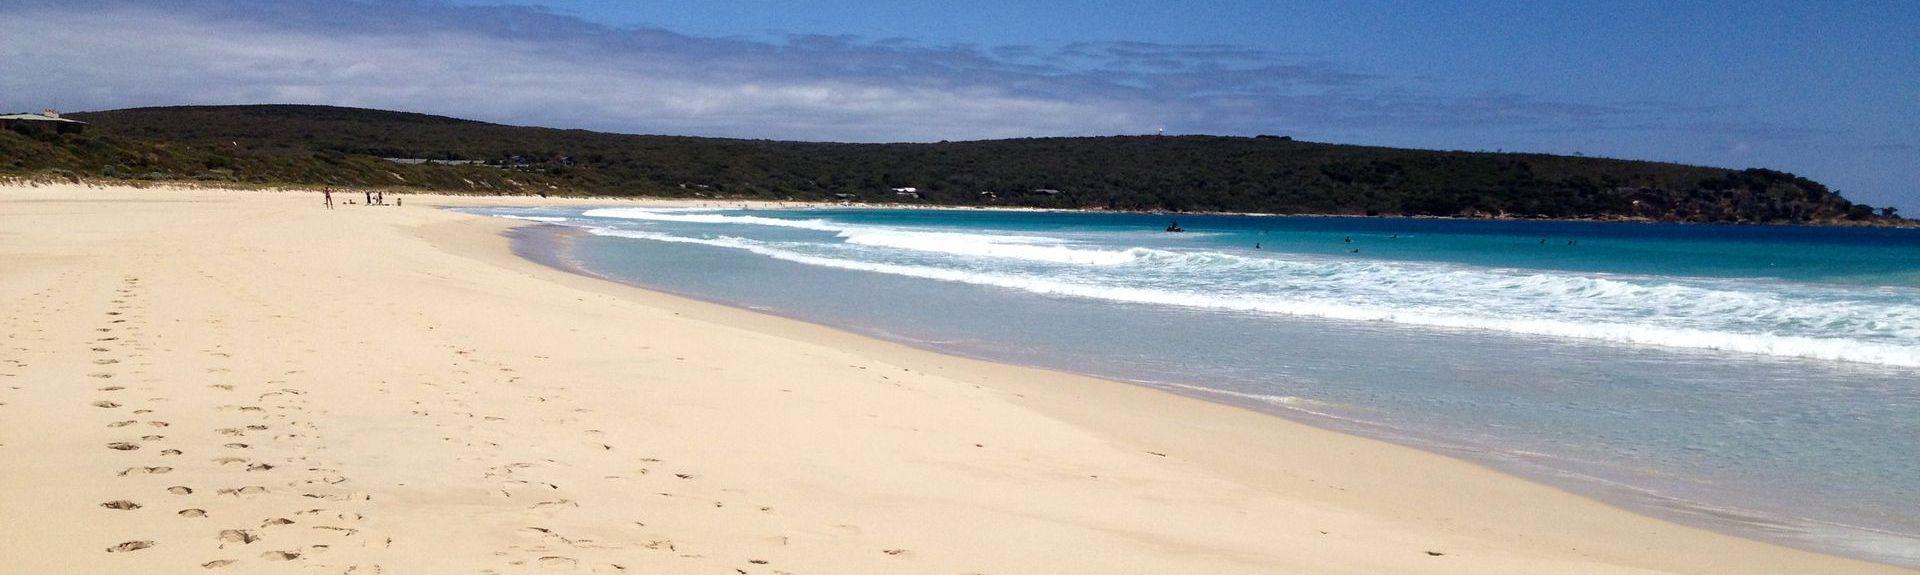 Quedjinup, Busselton, Australie-Occidentale, Australie